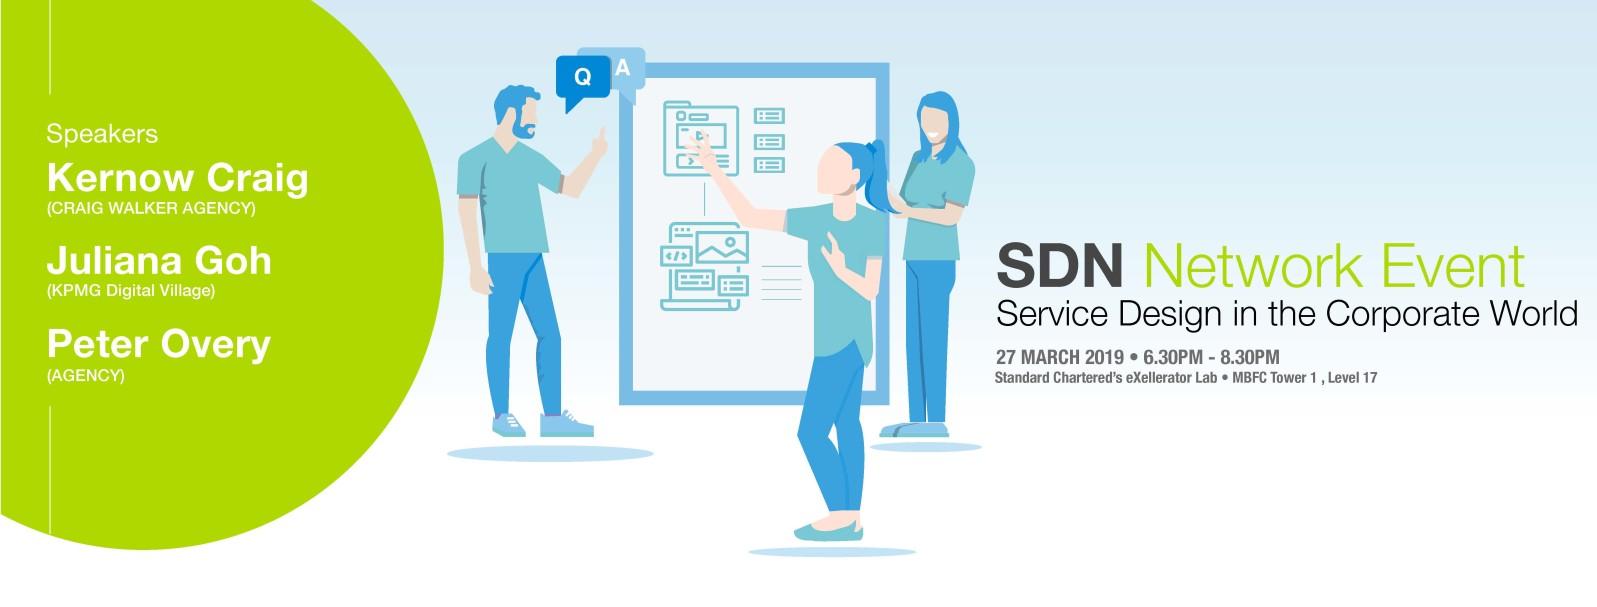 Service Design in the Corporate World